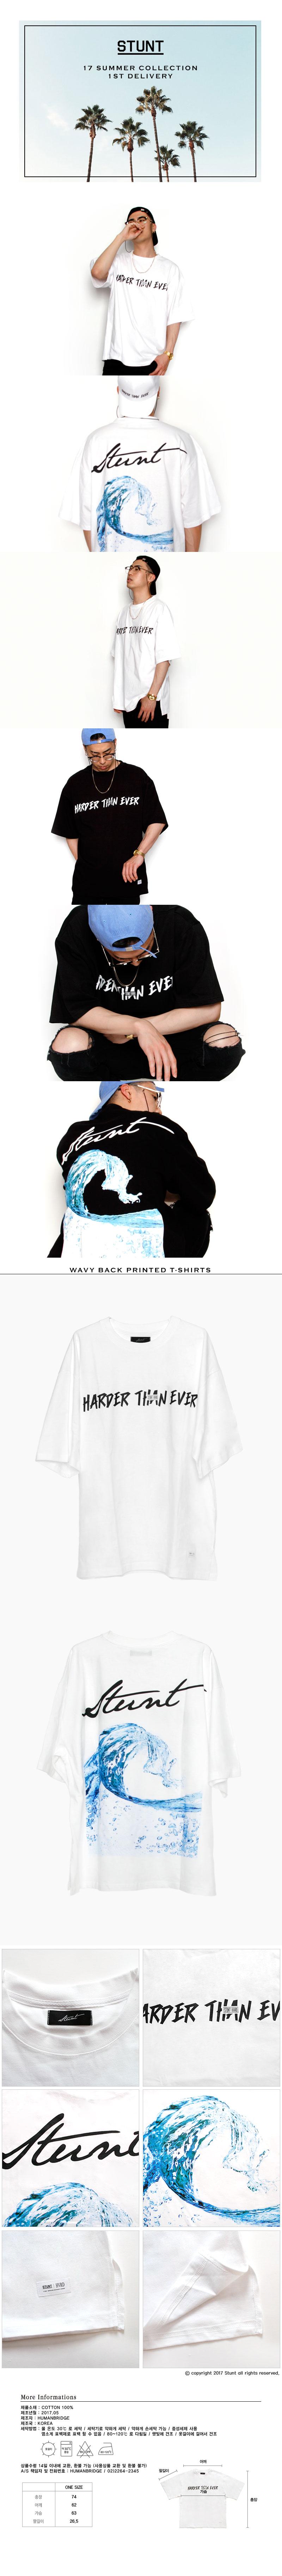 wavy-back-print-t-shirts-(white).jpg